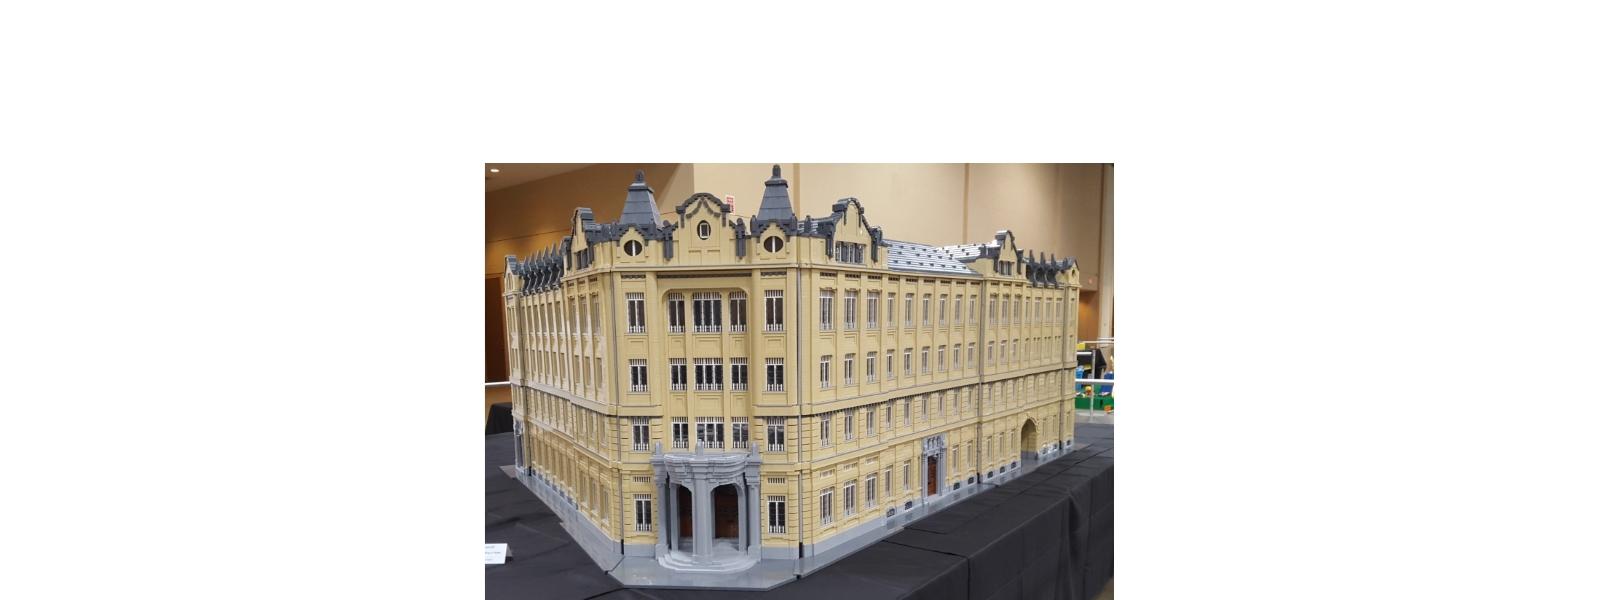 Postal Building 1600×600(437)